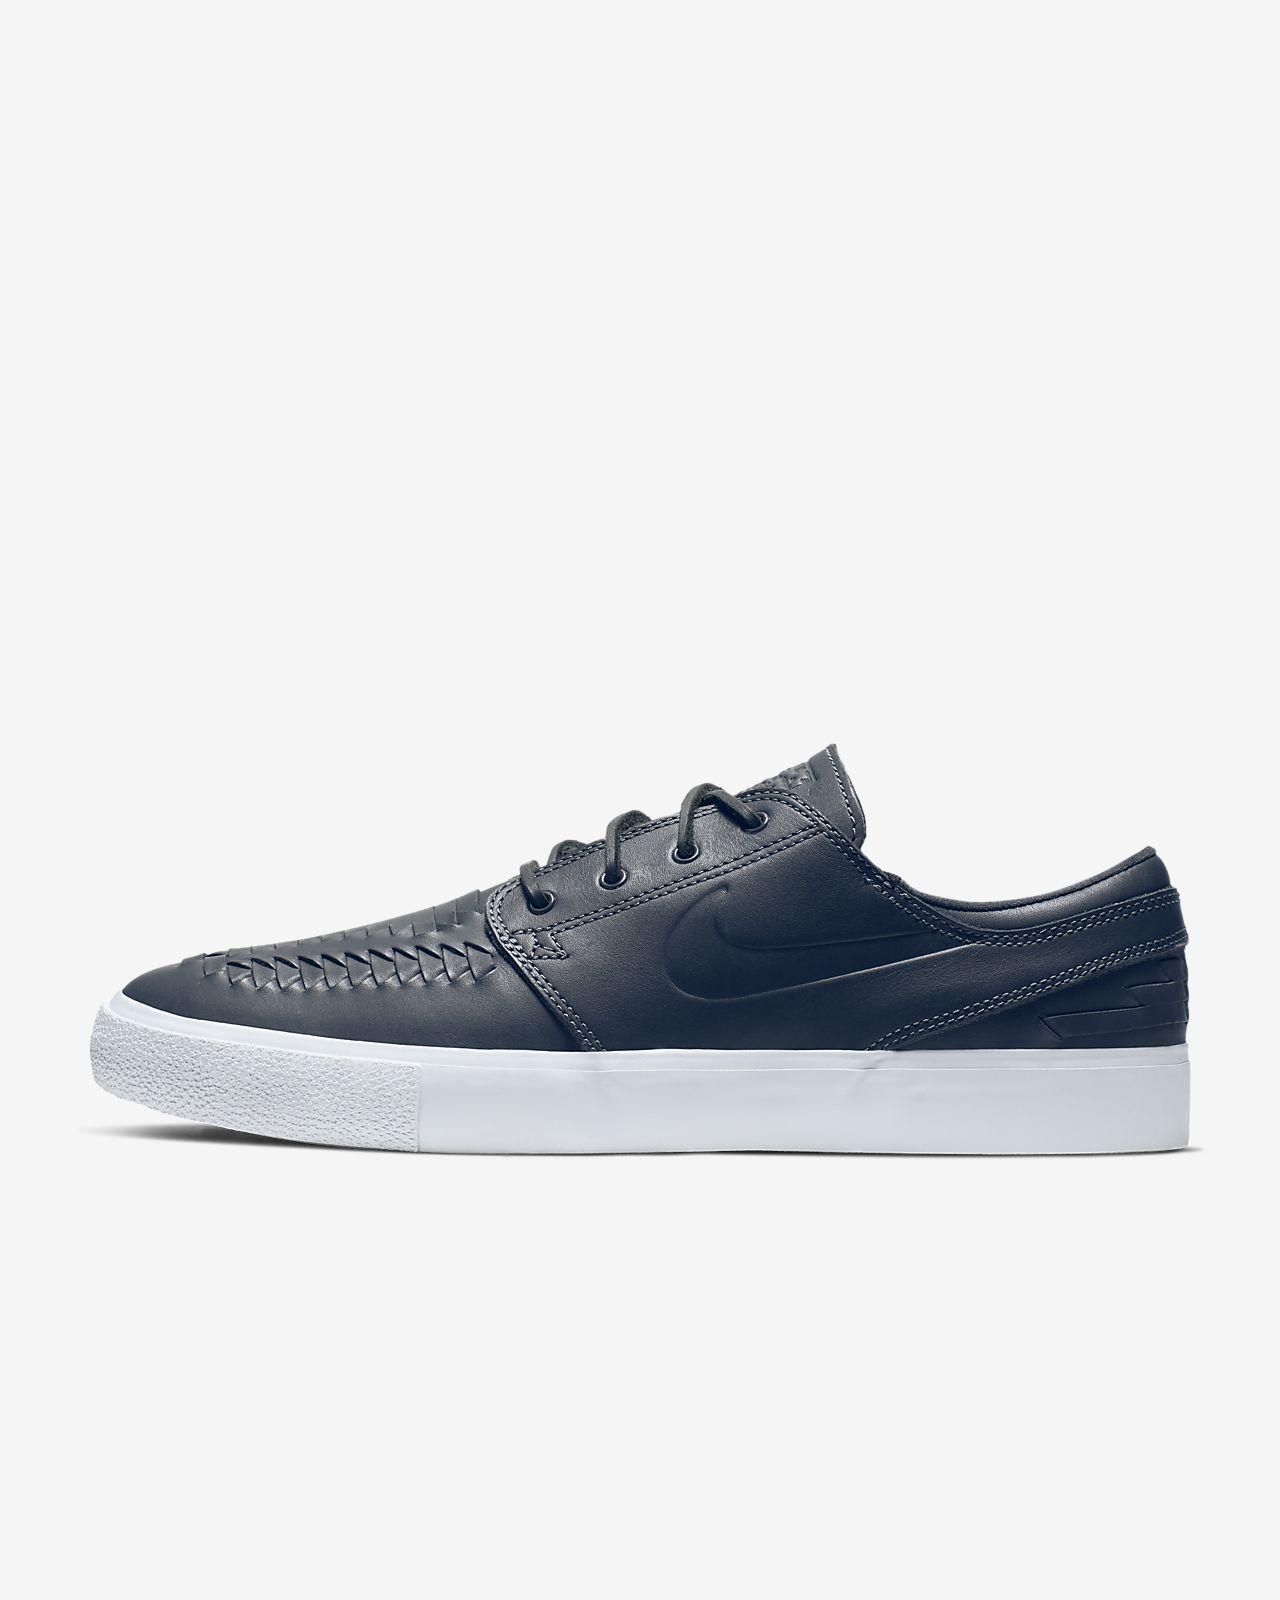 Skateboardová bota Nike SB Zoom Stefan Janoski RM Crafted